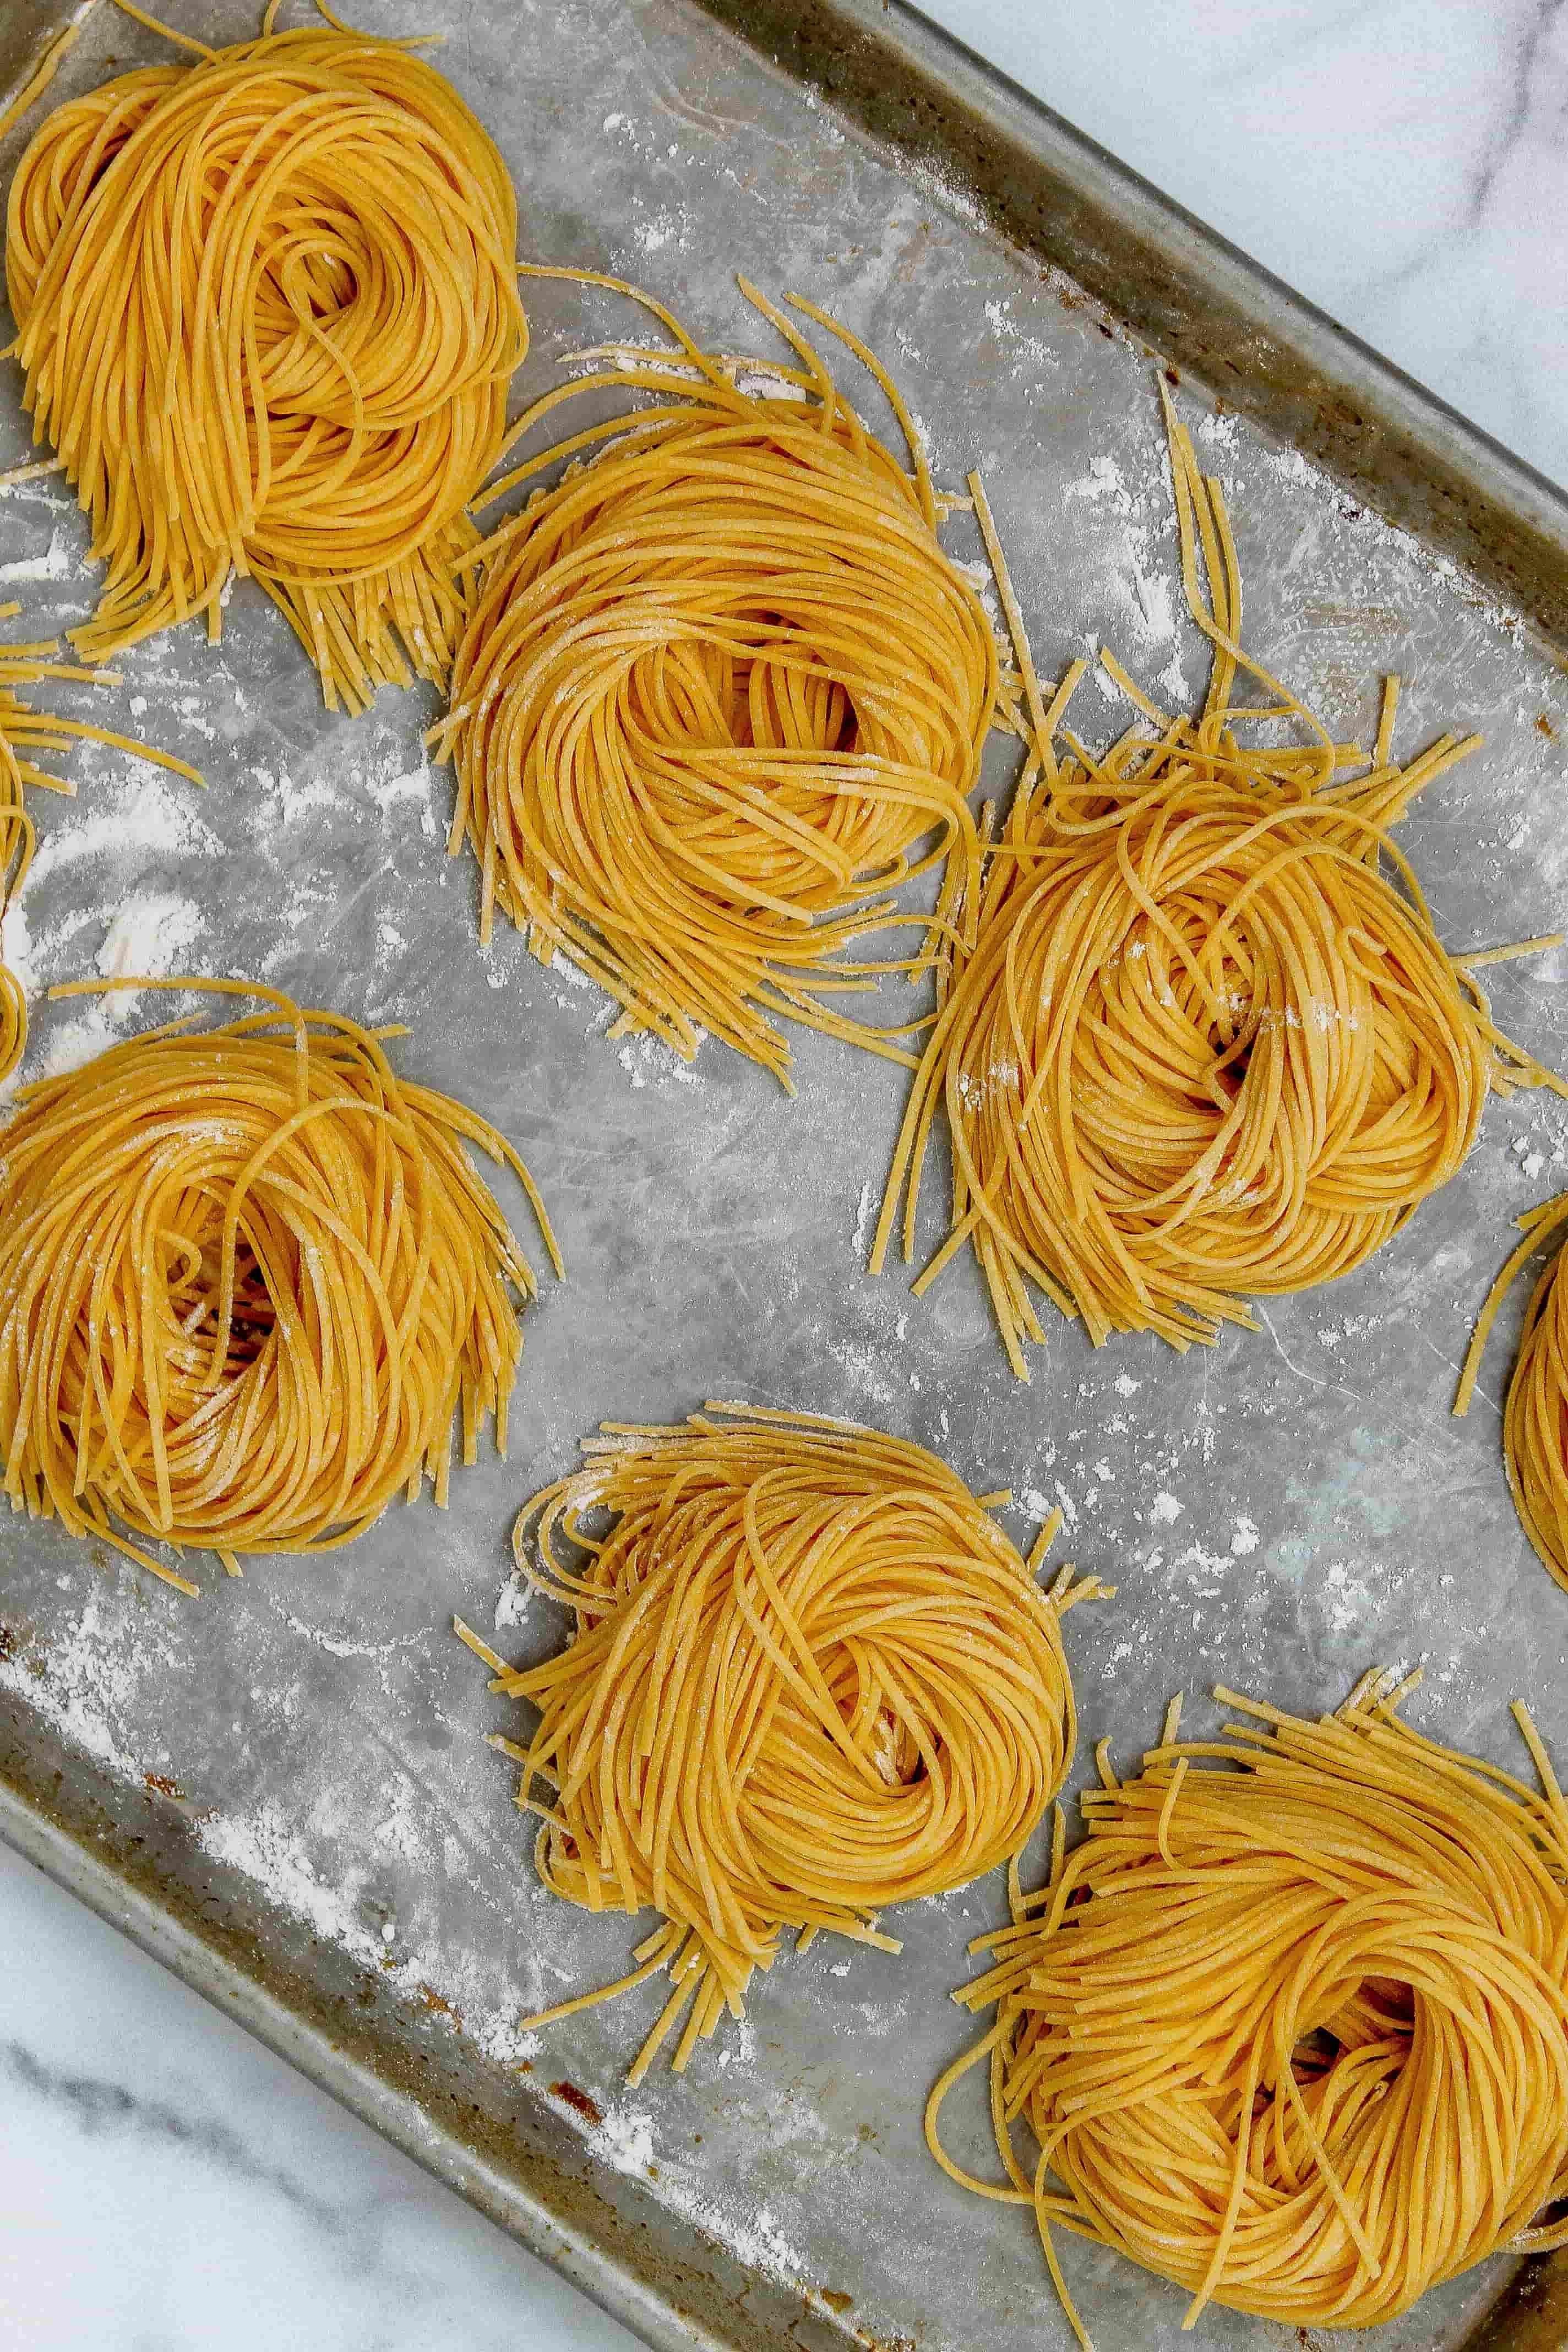 Homemade Pasta and Cannoli